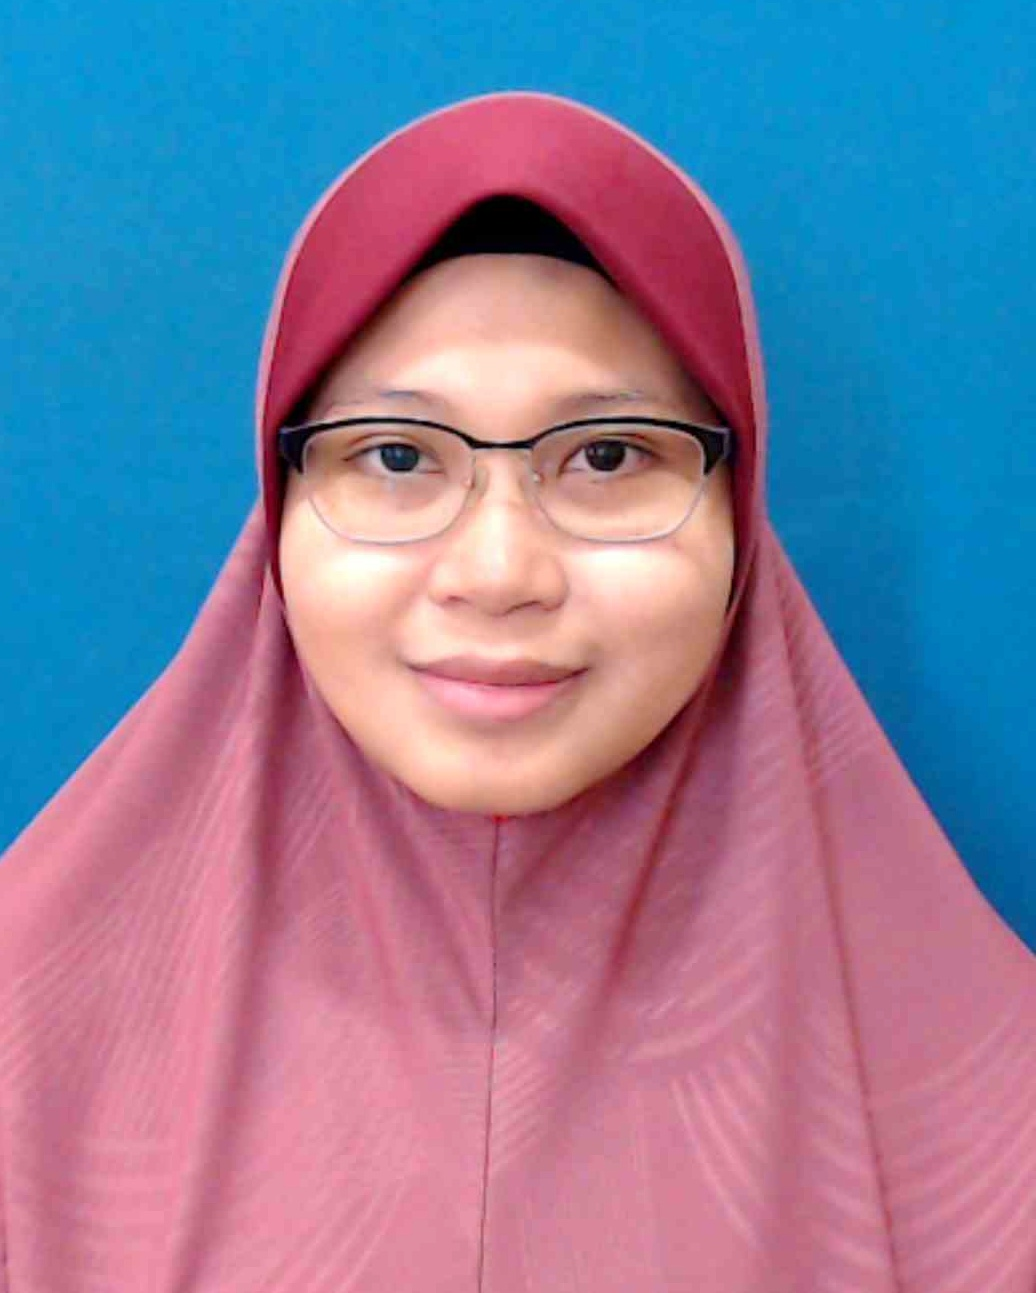 Noordianty Binti Abd Jalil